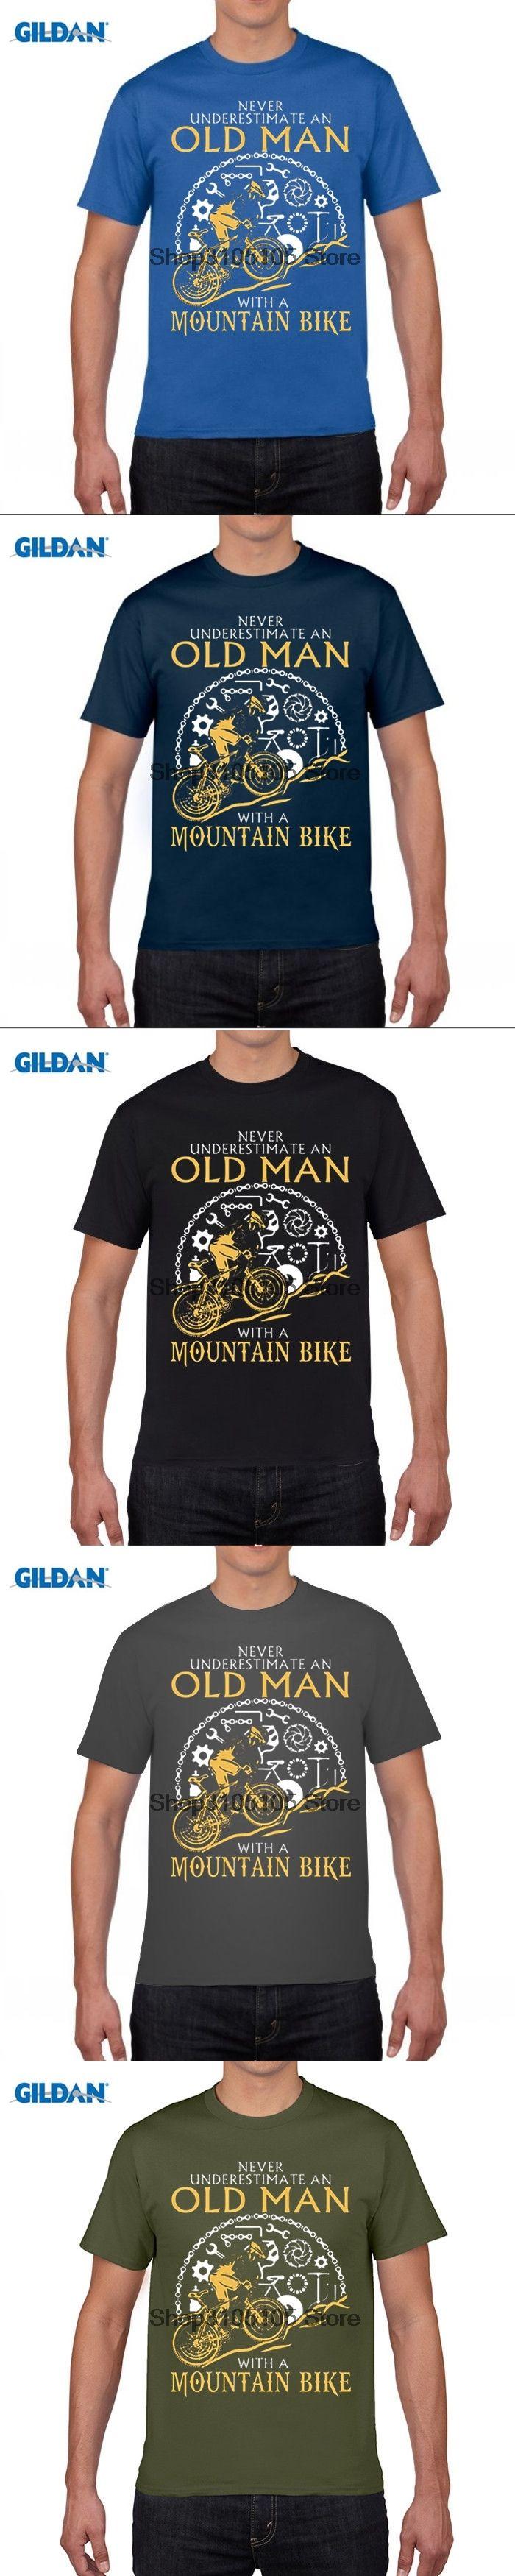 GILDAN designer t shirt Summer Mountain Biking Cyclist Old Men's Pre Cotton Short Sleeve Round Neck T-Shirt